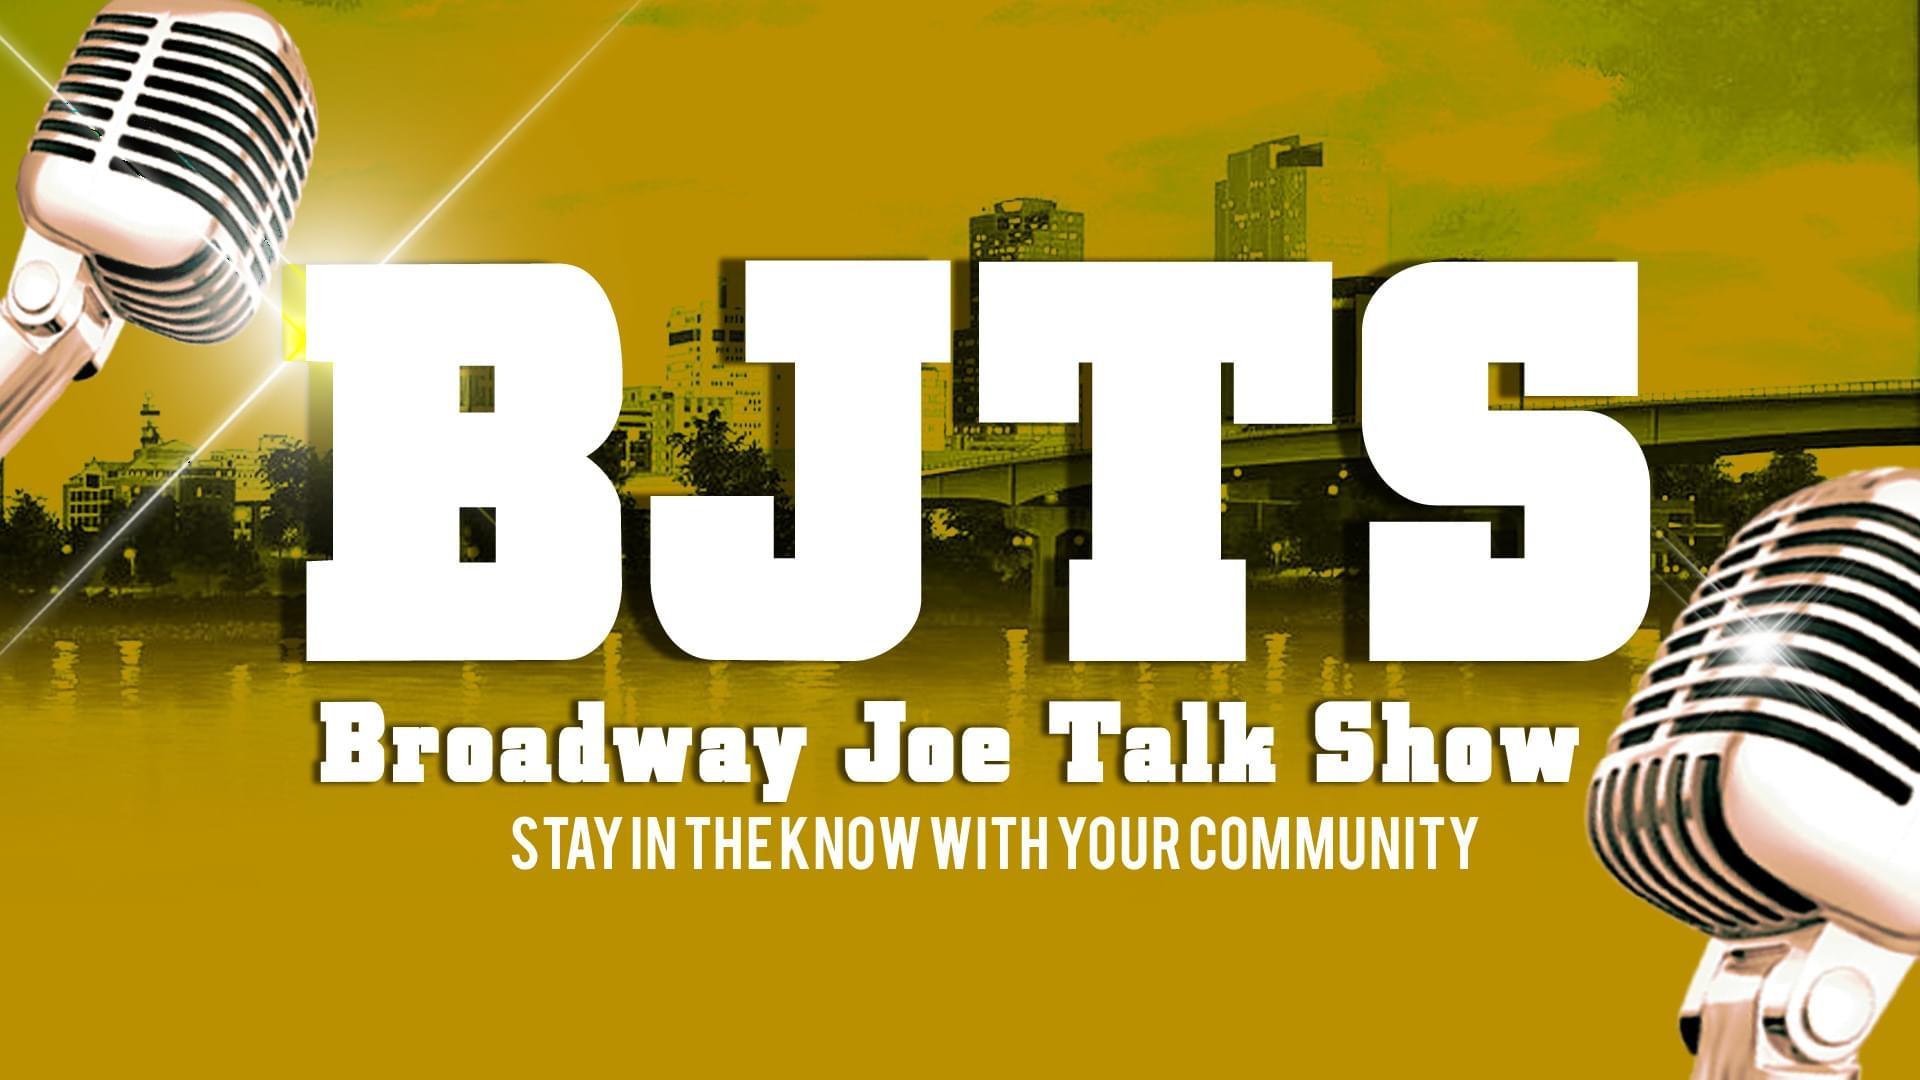 Broadway Joe Talk Show   December 12, 2019